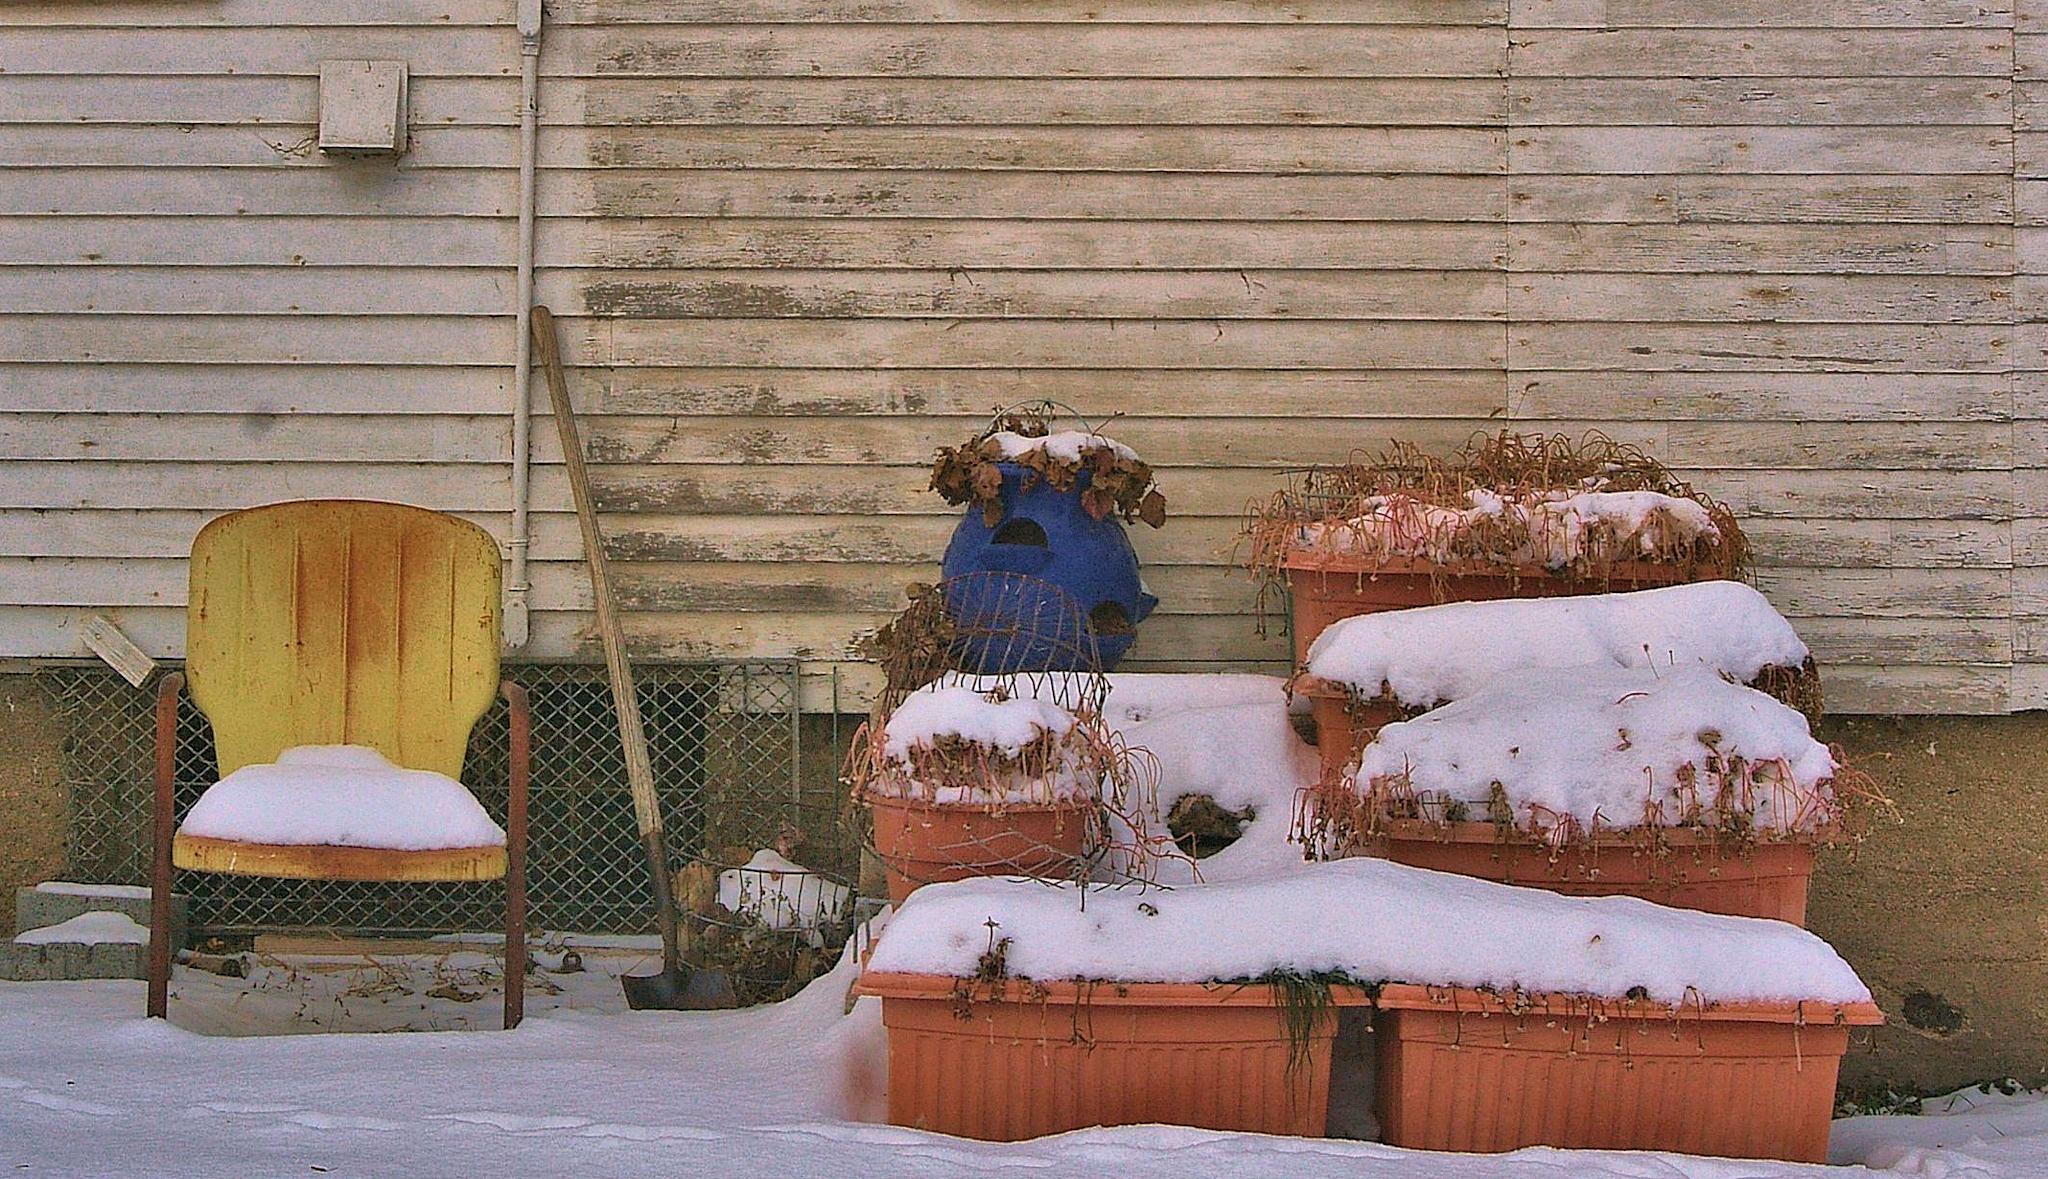 Rusty yellow Chair, frozen flowers by Terri Lyn Jolly (terridactyle)